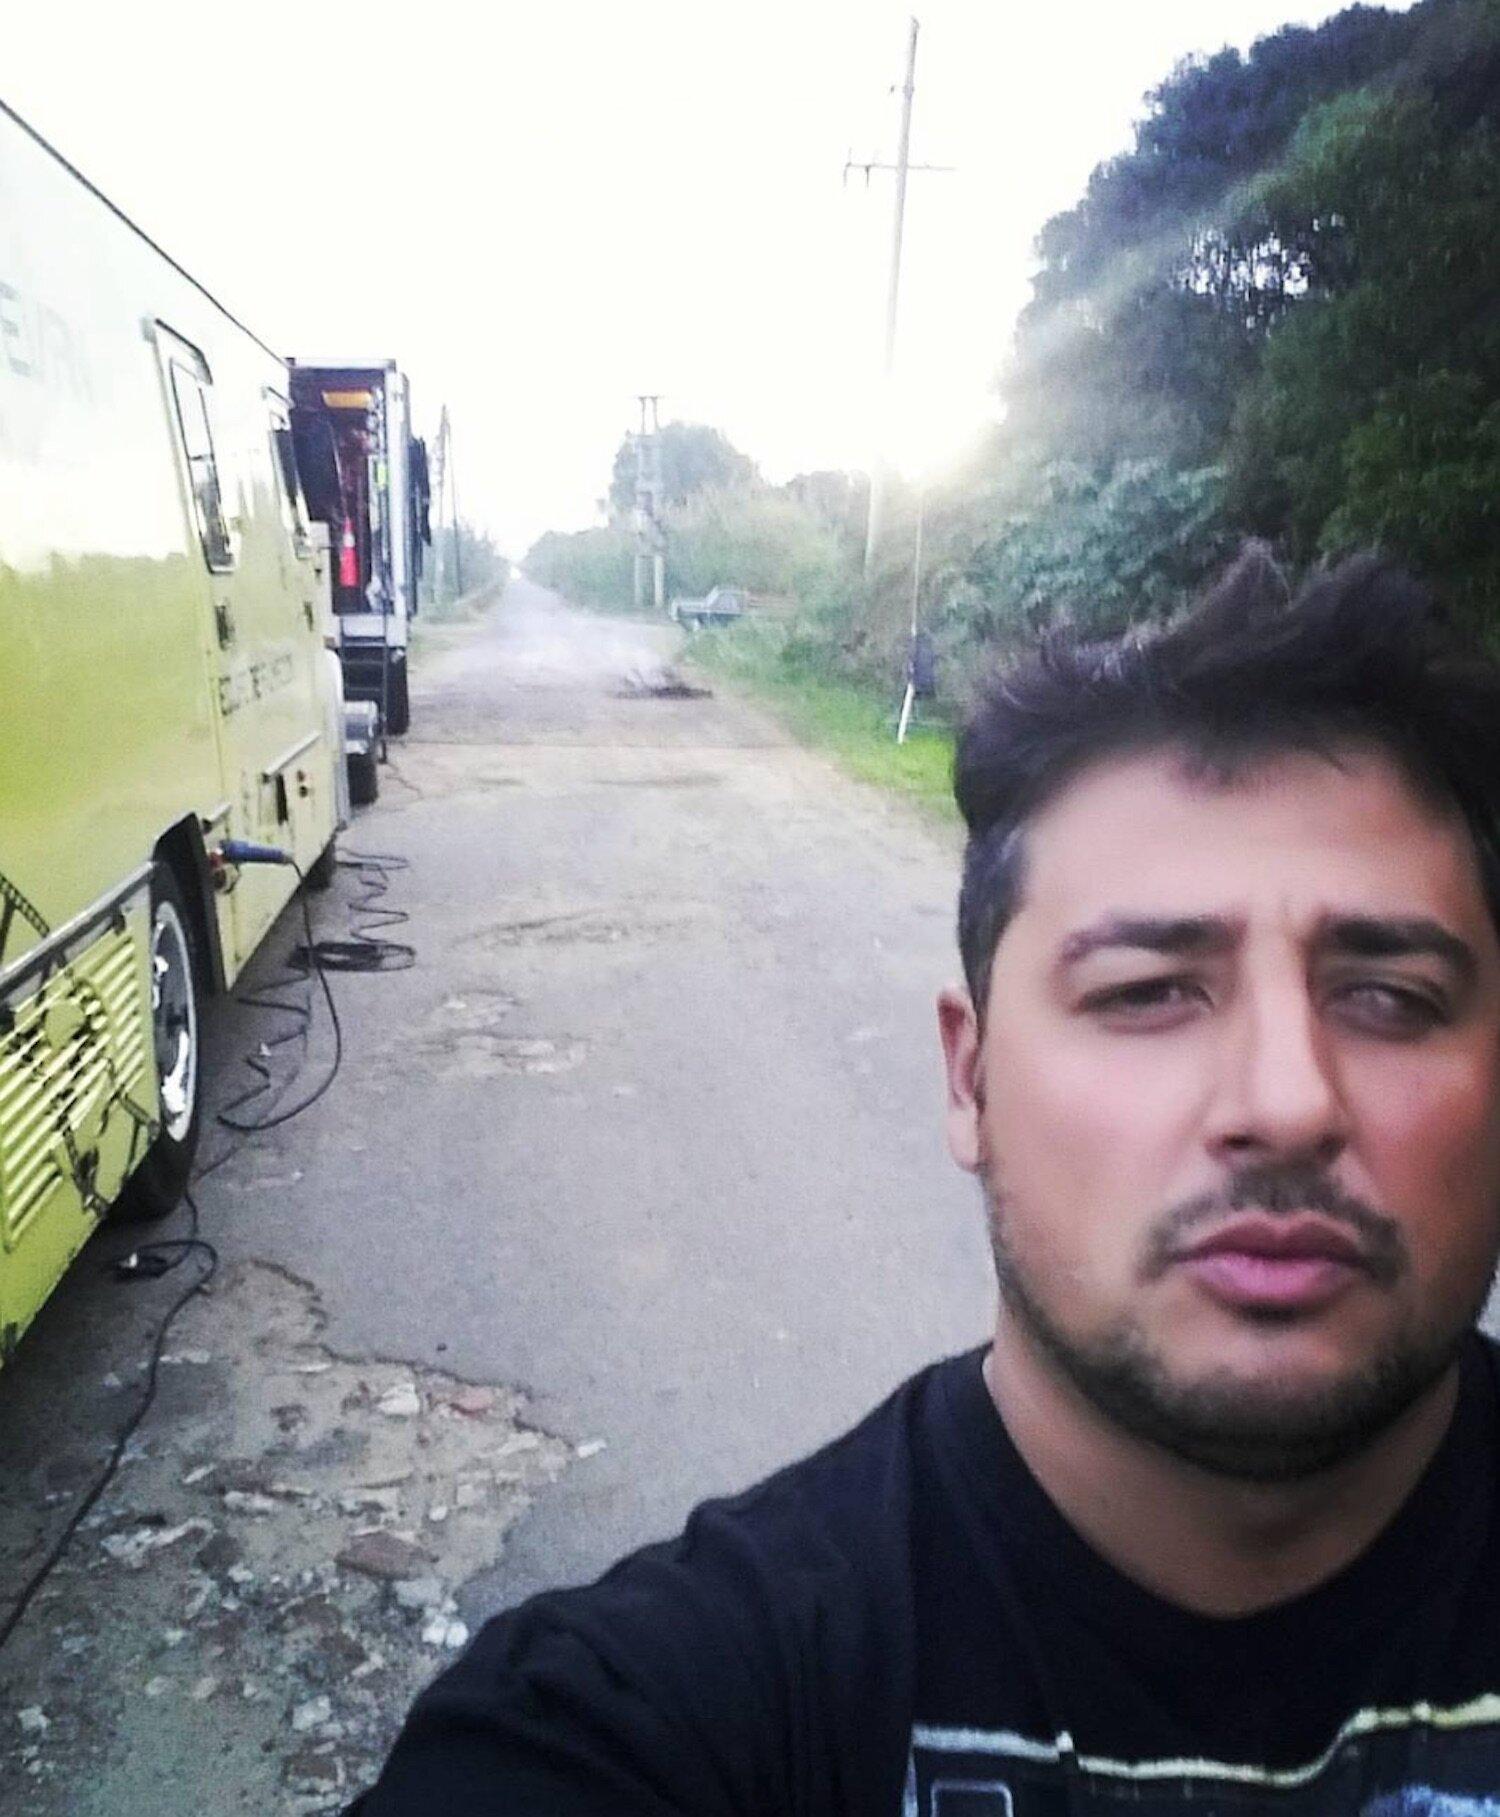 Diego Mesaglio